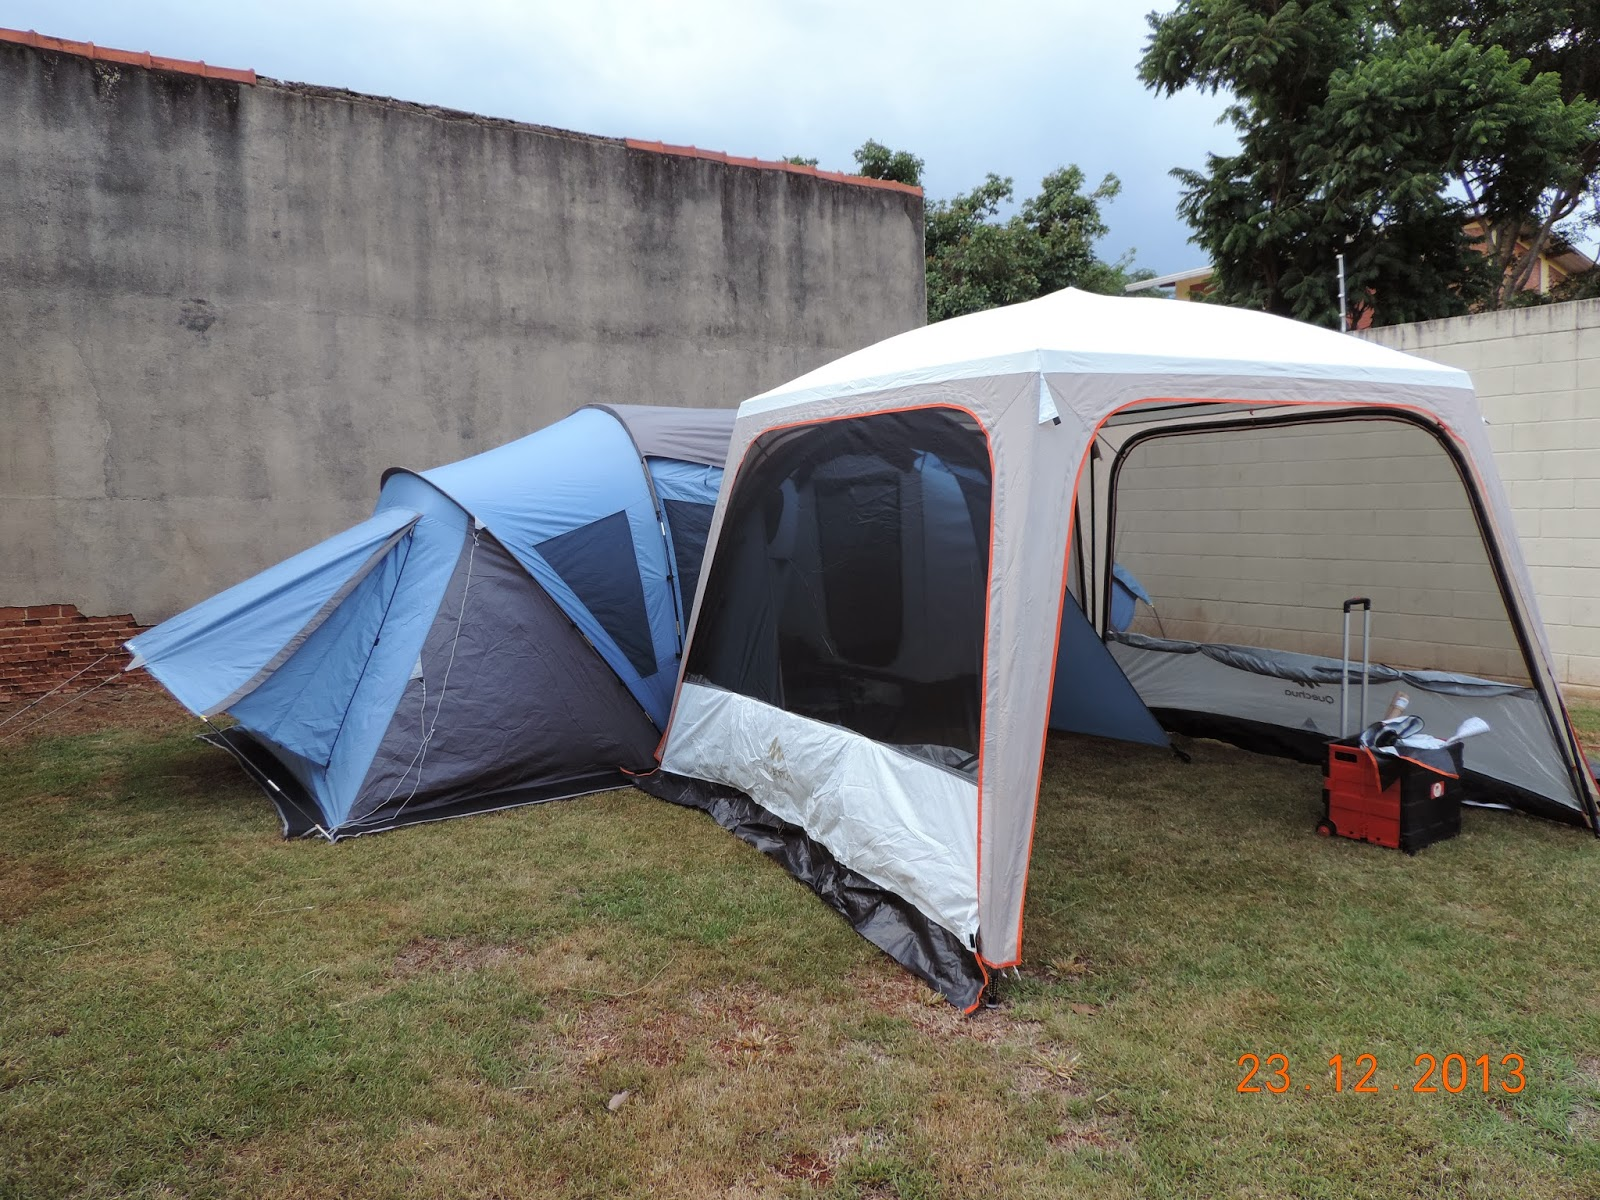 cbf3446f4 camping   tecnologia  camping urbano (gazebo quechua fresh)